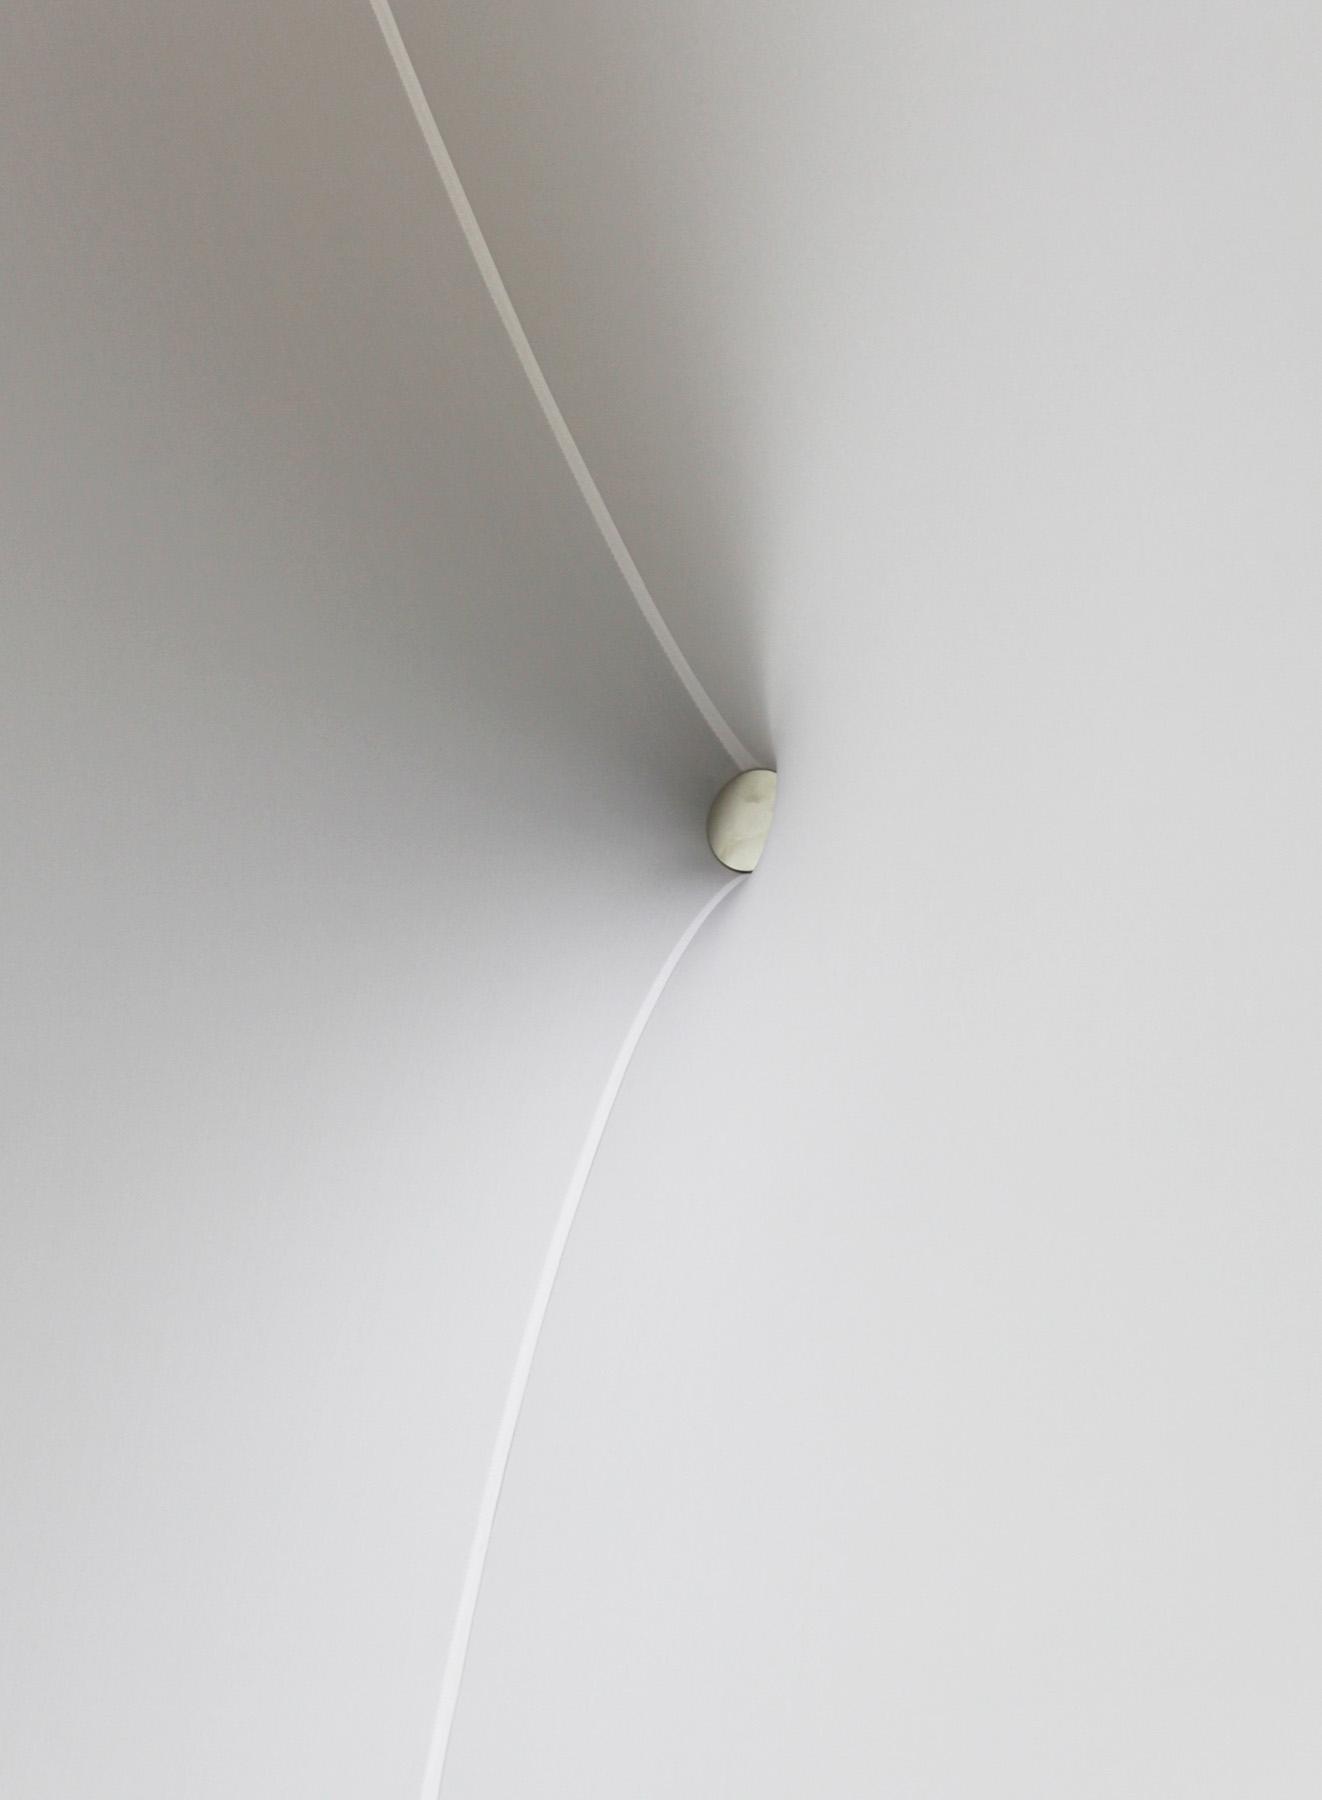 """JIBA SN"" - 2014 Magnet, cloth, wood / 460 x 300 x 200cm Nordrhein-Westfalen, NRW Landtag, Düsseldorf, Germany"